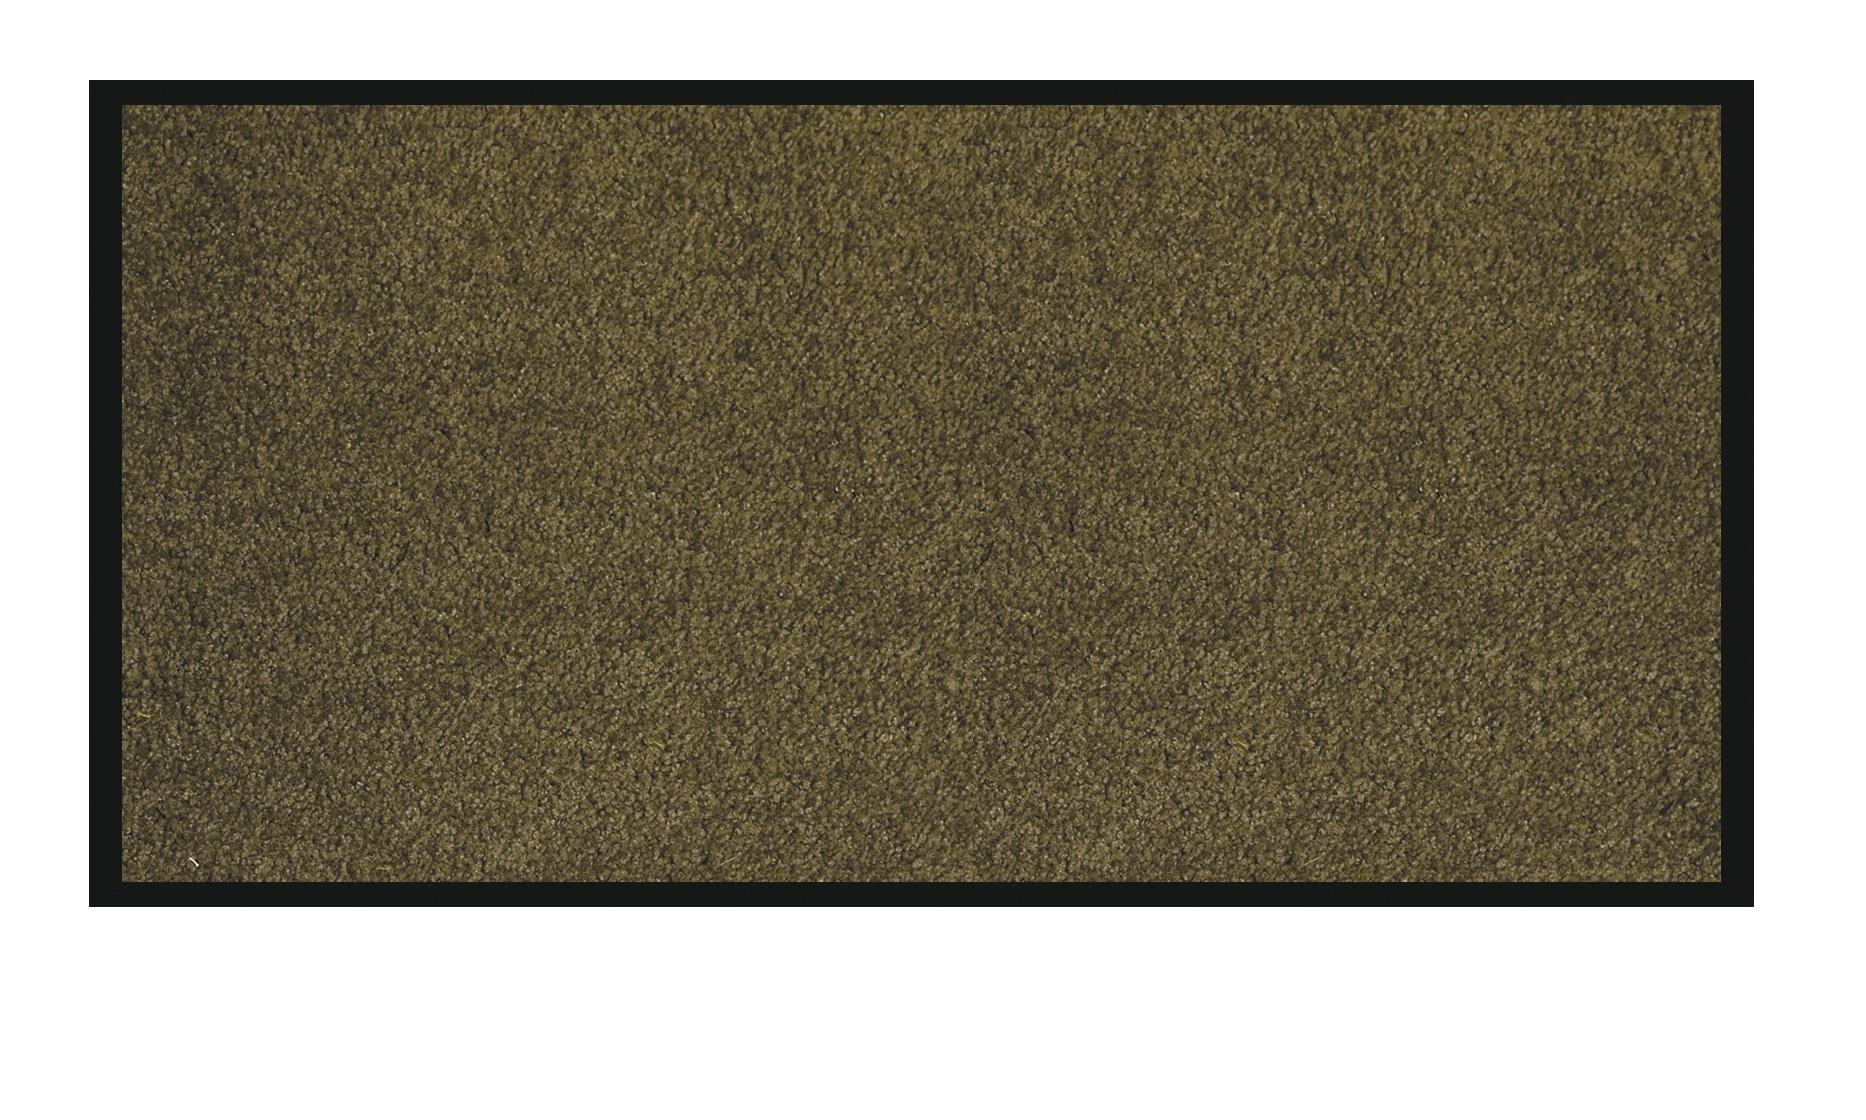 Tapis de sol absorbant RAINBOW - 90 x 150 cm - en polyamide - brun